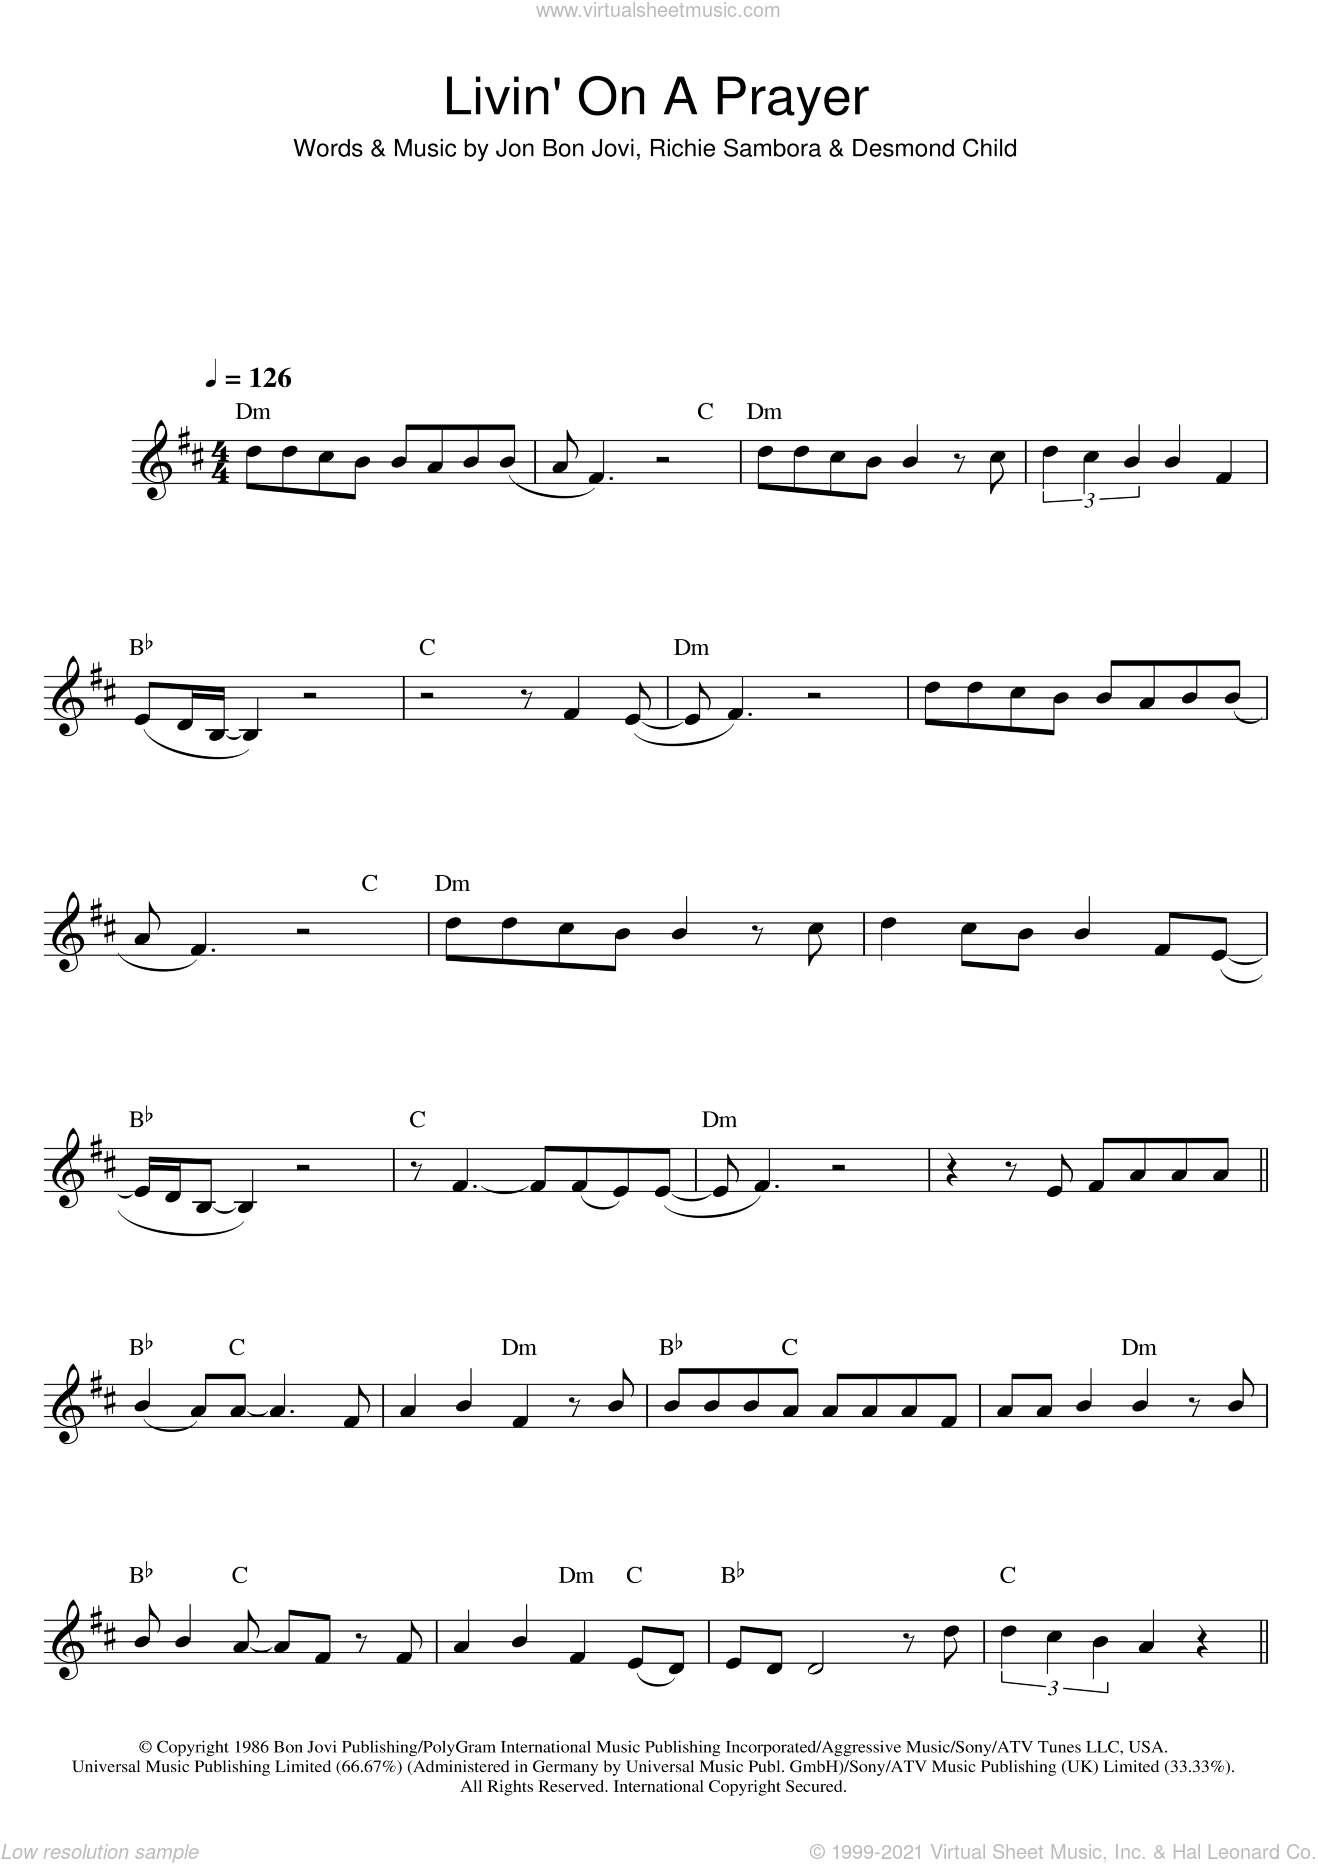 Jovi - Livin' On A Prayer sheet music for saxophone solo [PDF]